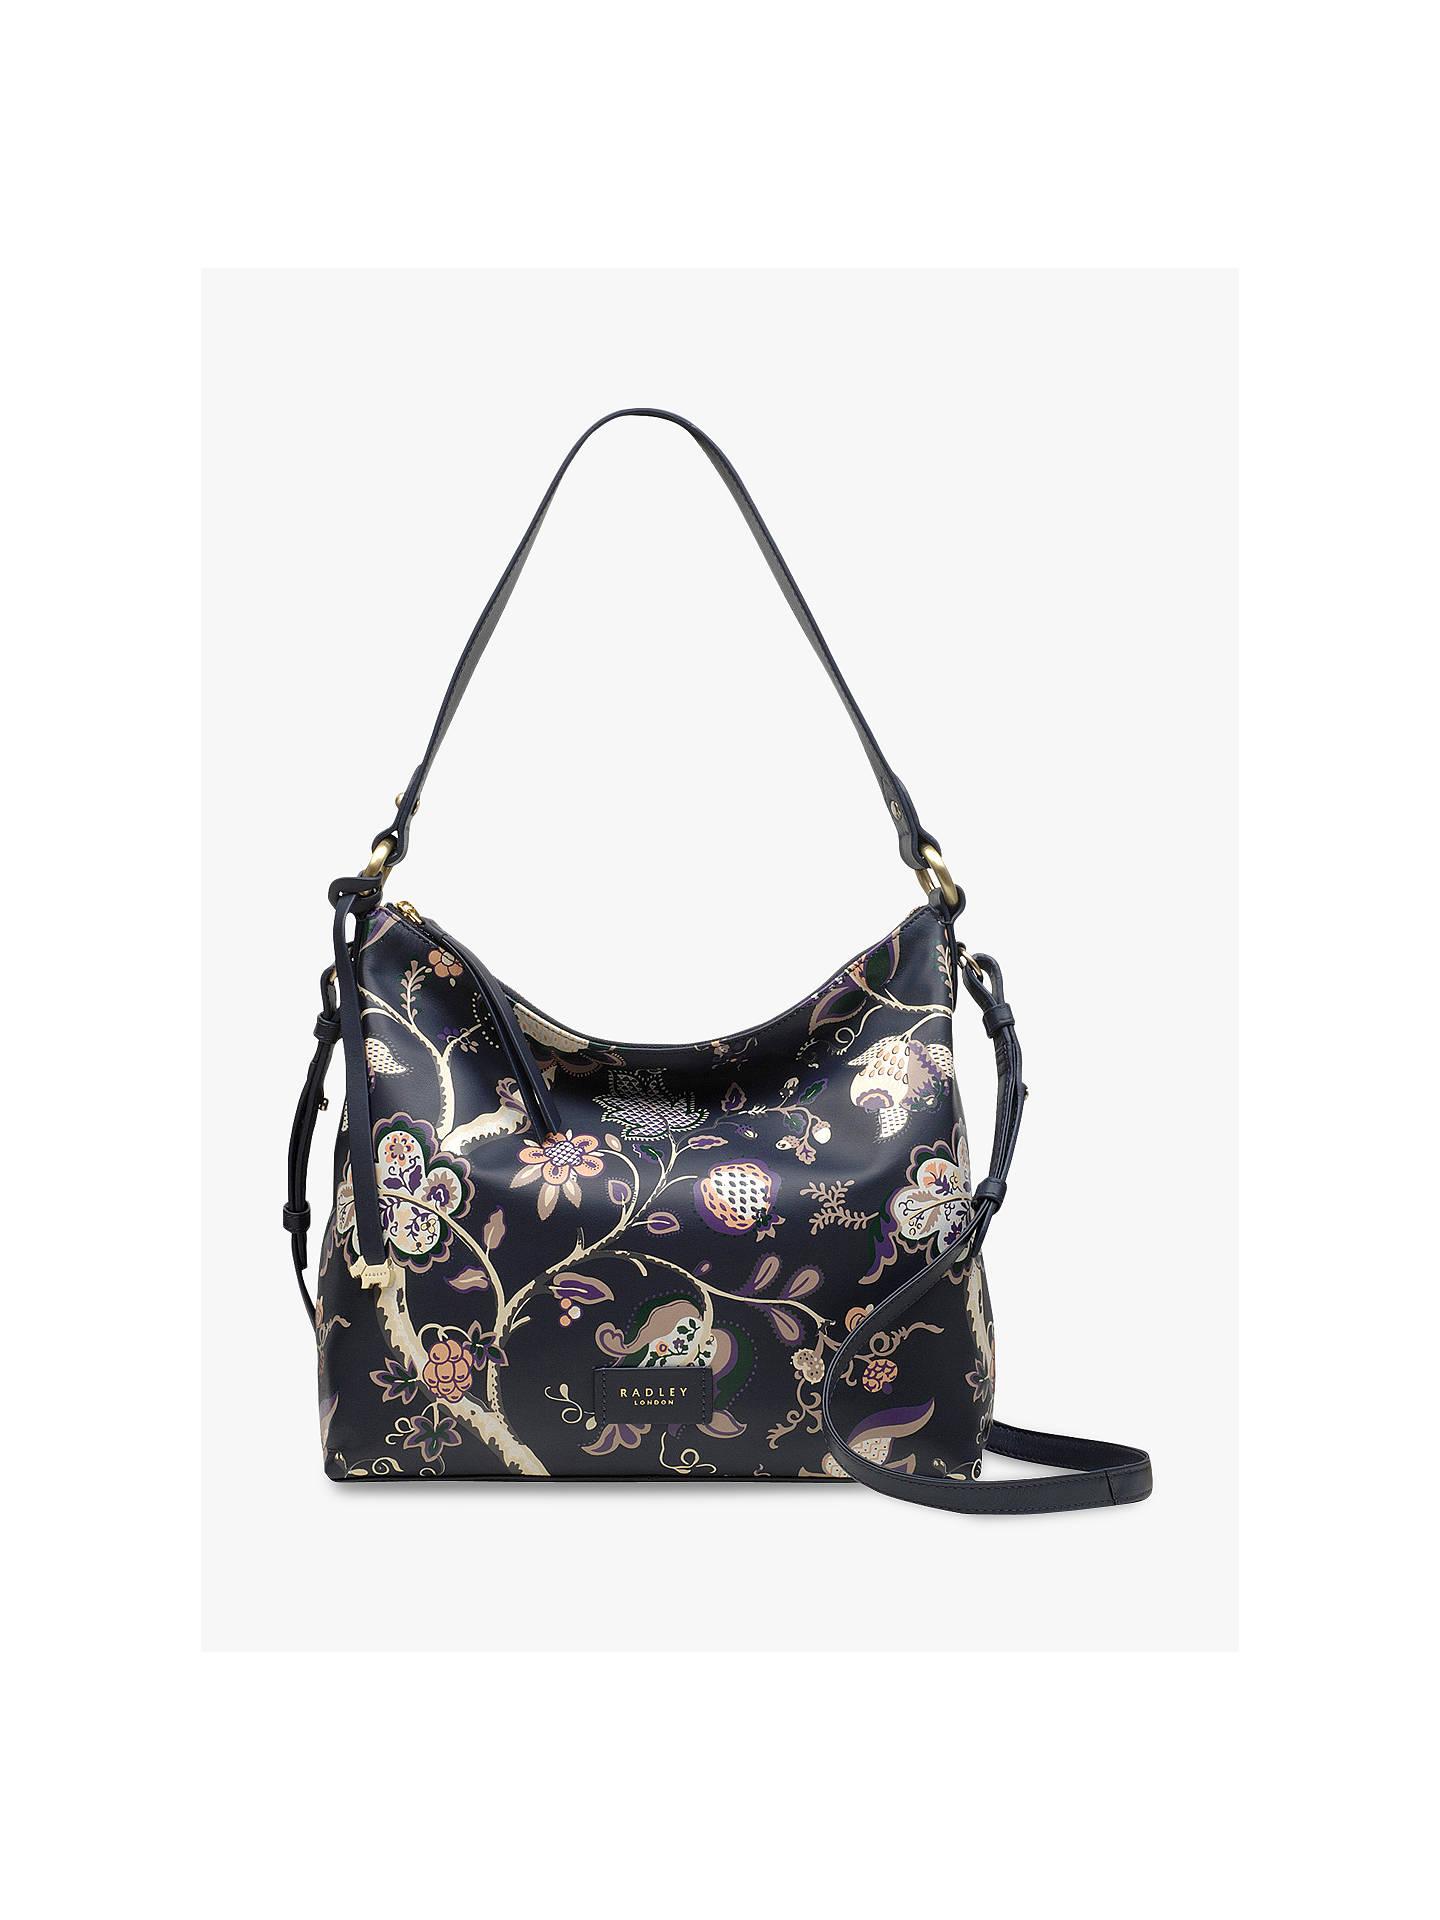 7432acf5fdcb Buy Radley Sanderson Medium Leather Shoulder Bag